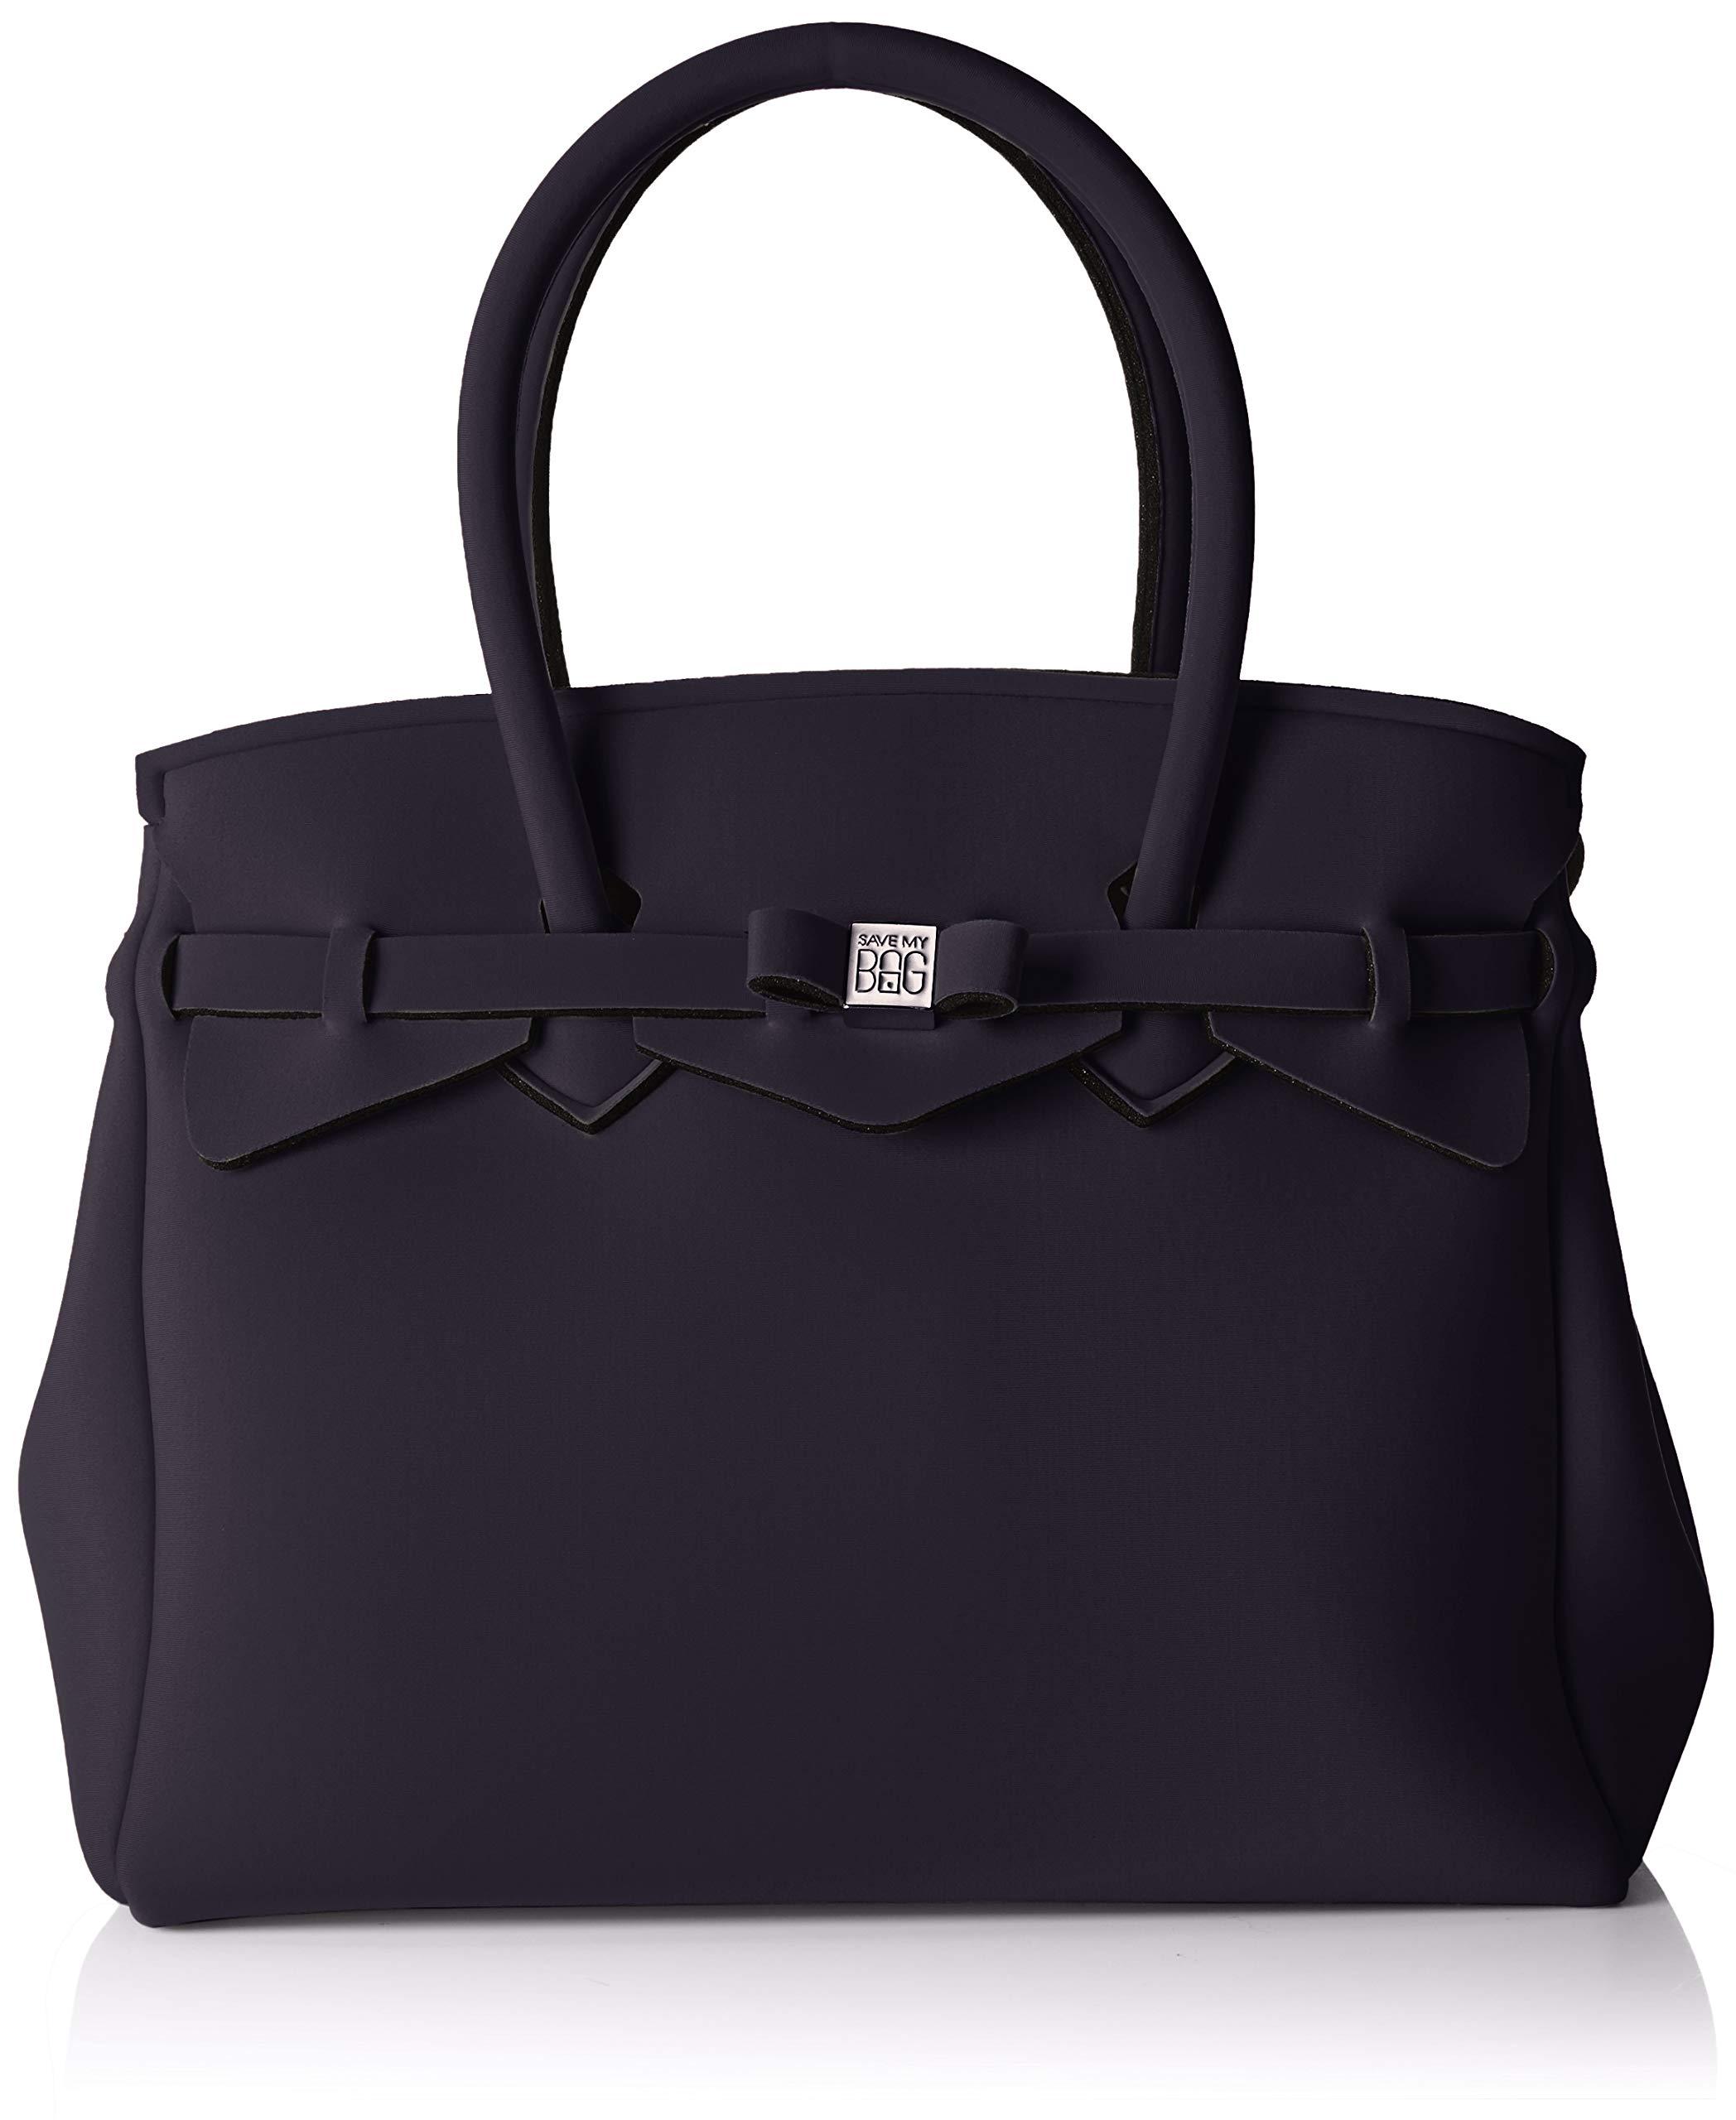 Bag Bandoulière X Ner34x29x18 FemmeNoirnero Cmw LEu H 20204nSac Save My hQdCxrtsBo